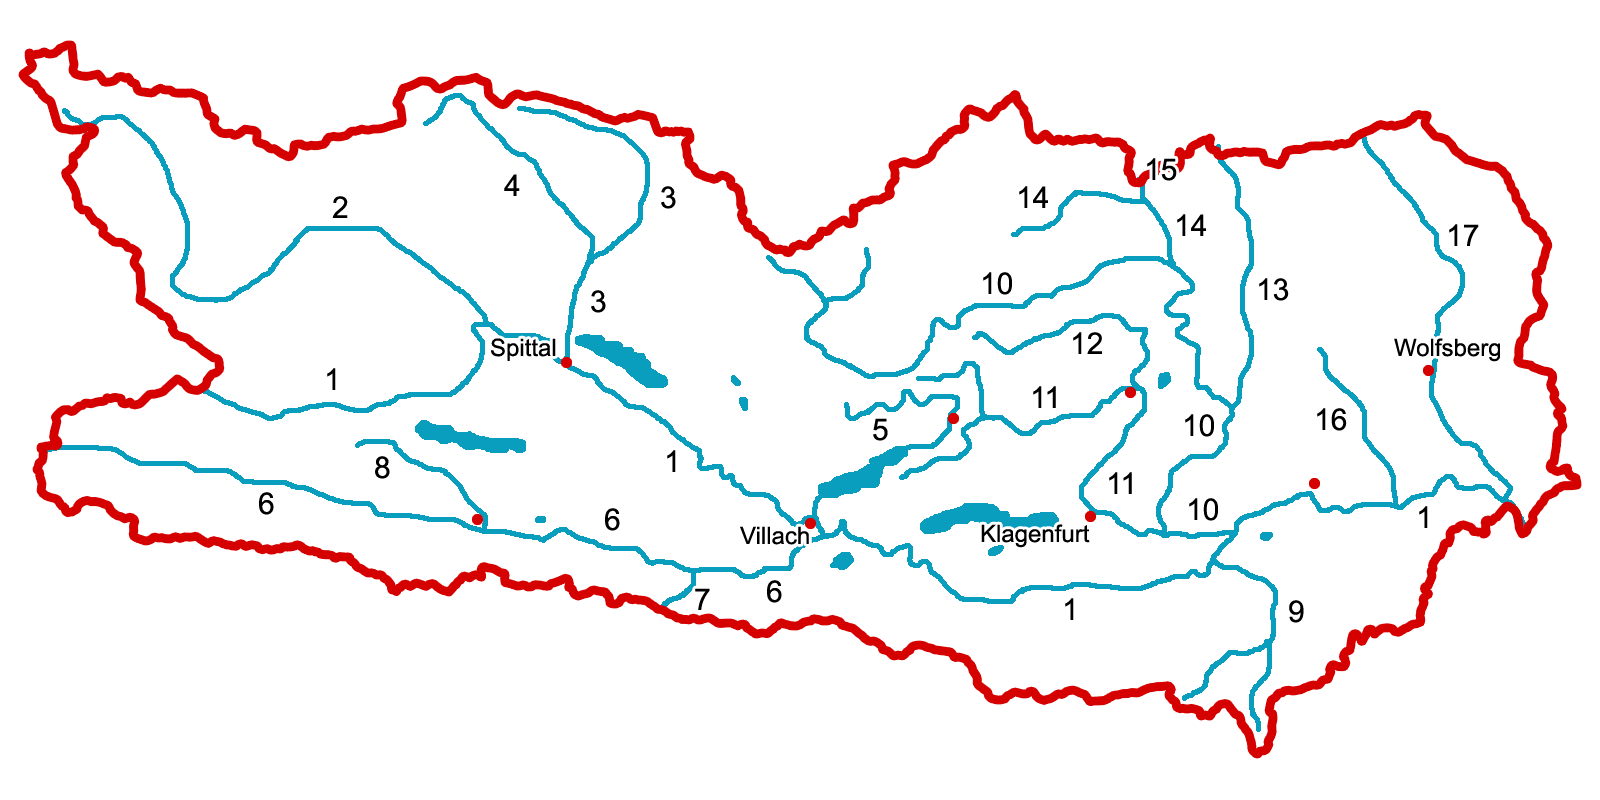 Steiermark Karte Flüsse.23 Bilder Flusskarte Steiermark